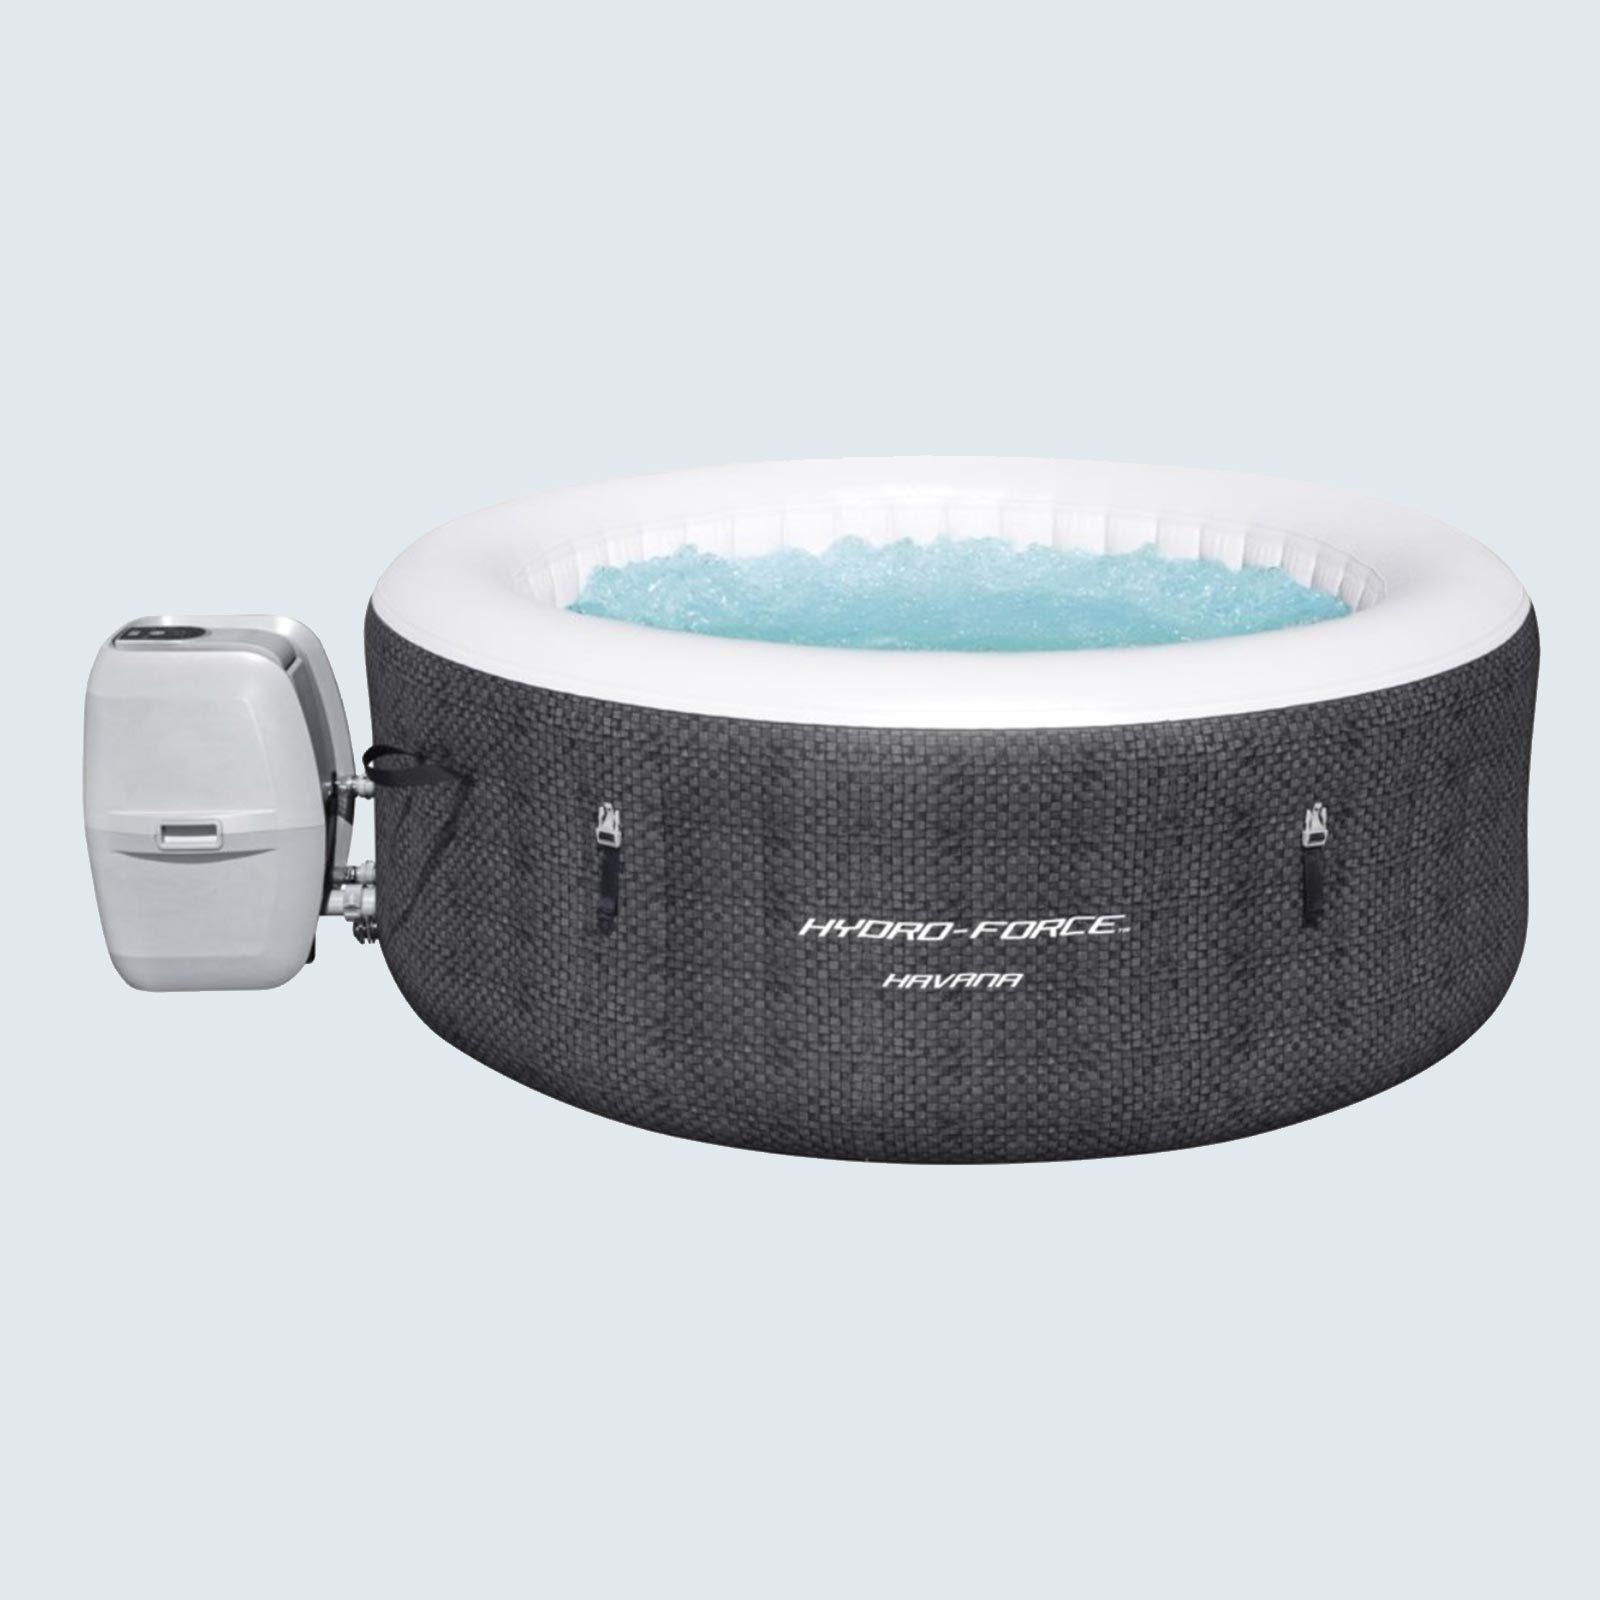 Hydro-Force Havana Inflatable Hot Tub Spa